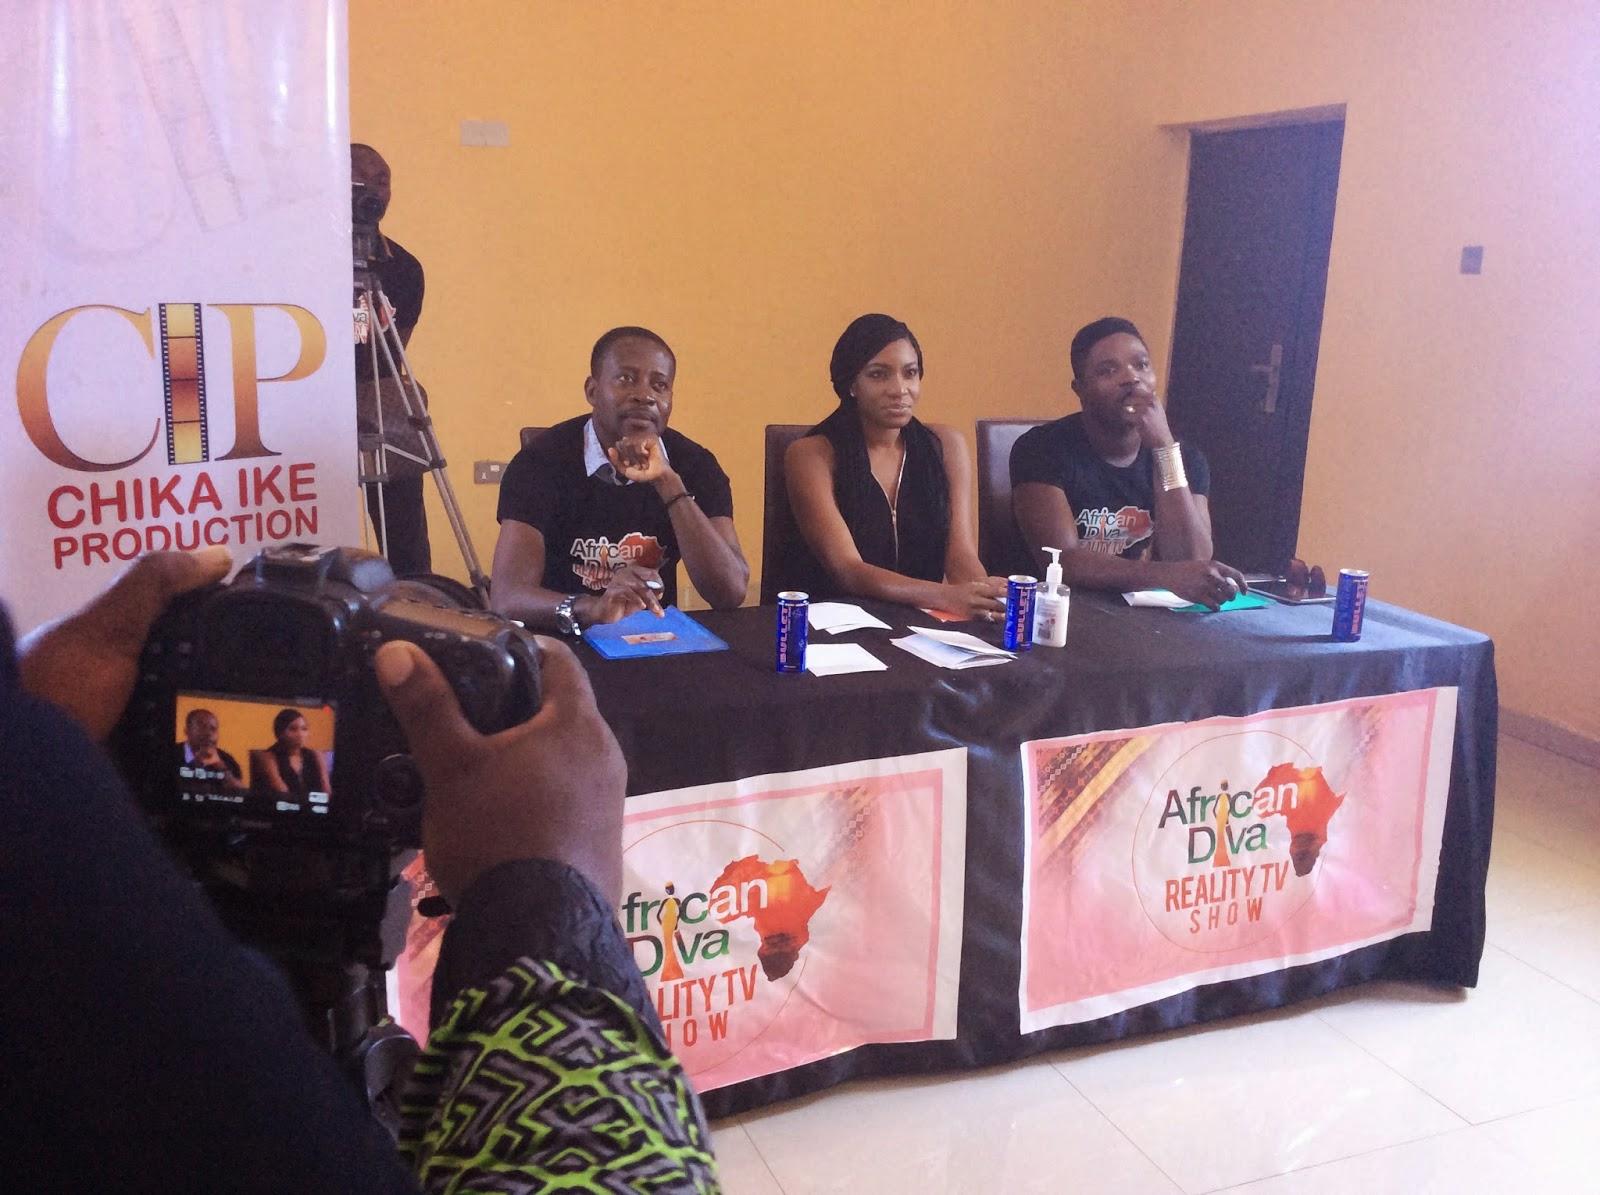 african diva chika ike tv show